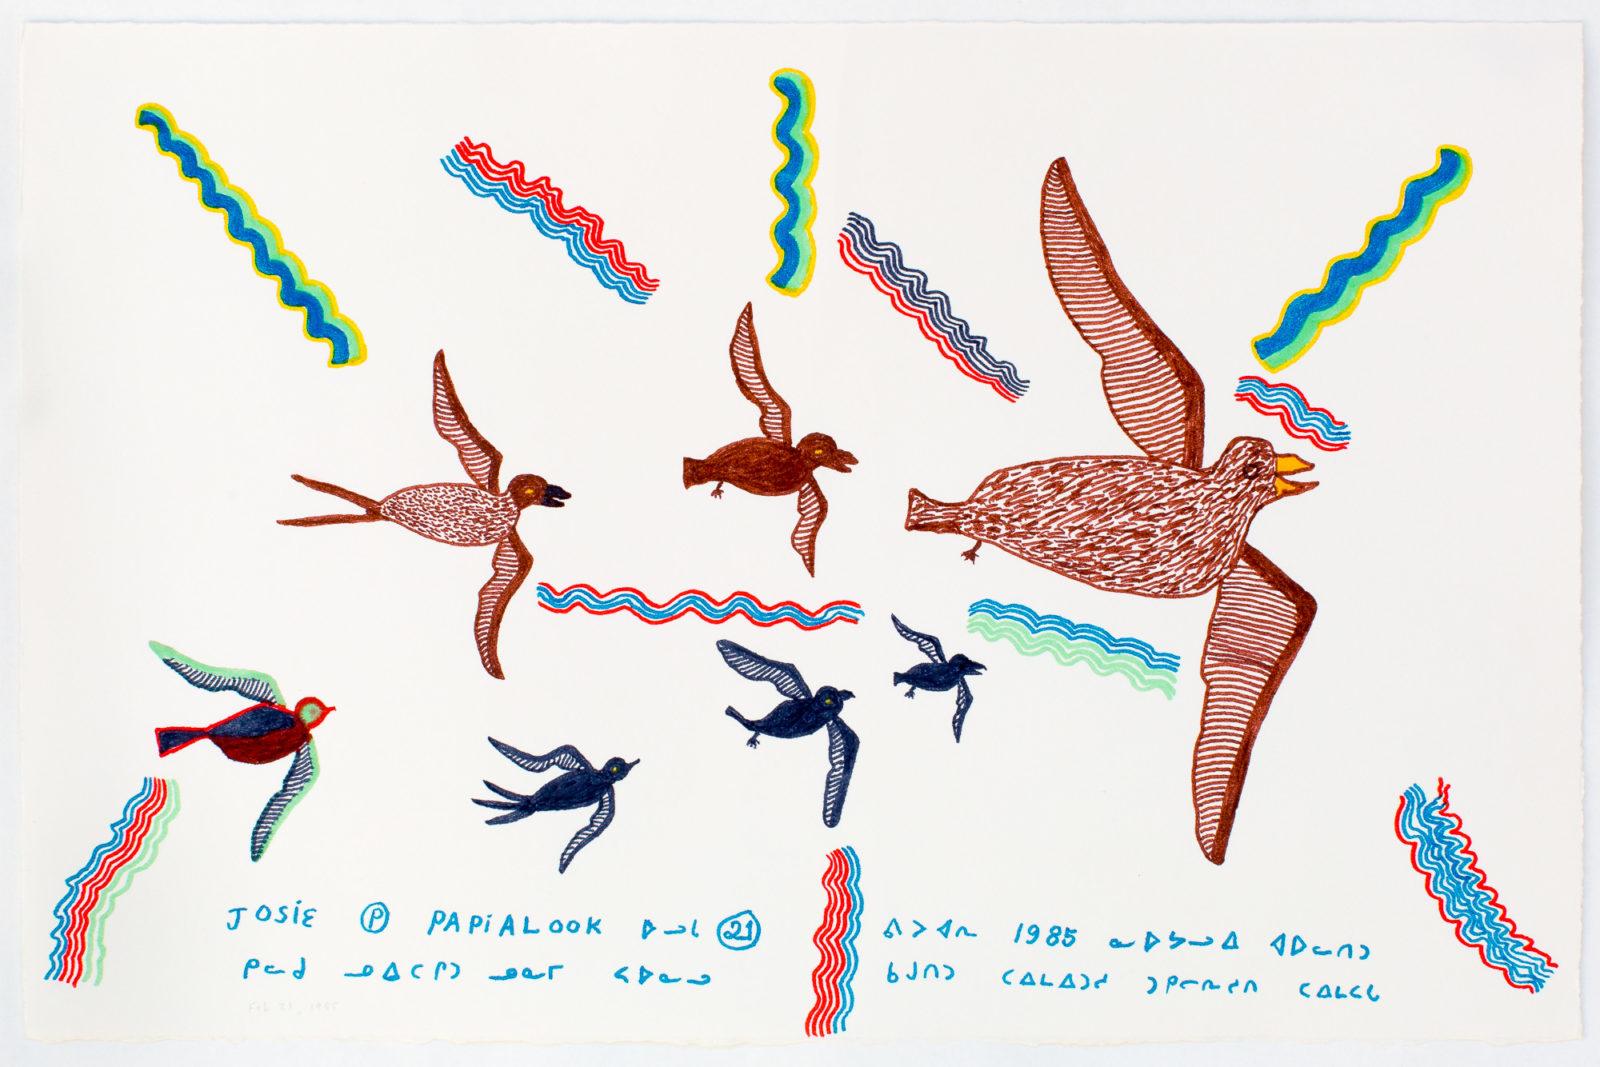 Josie Pamiutu Papialuk  - untitled (birds and wind)